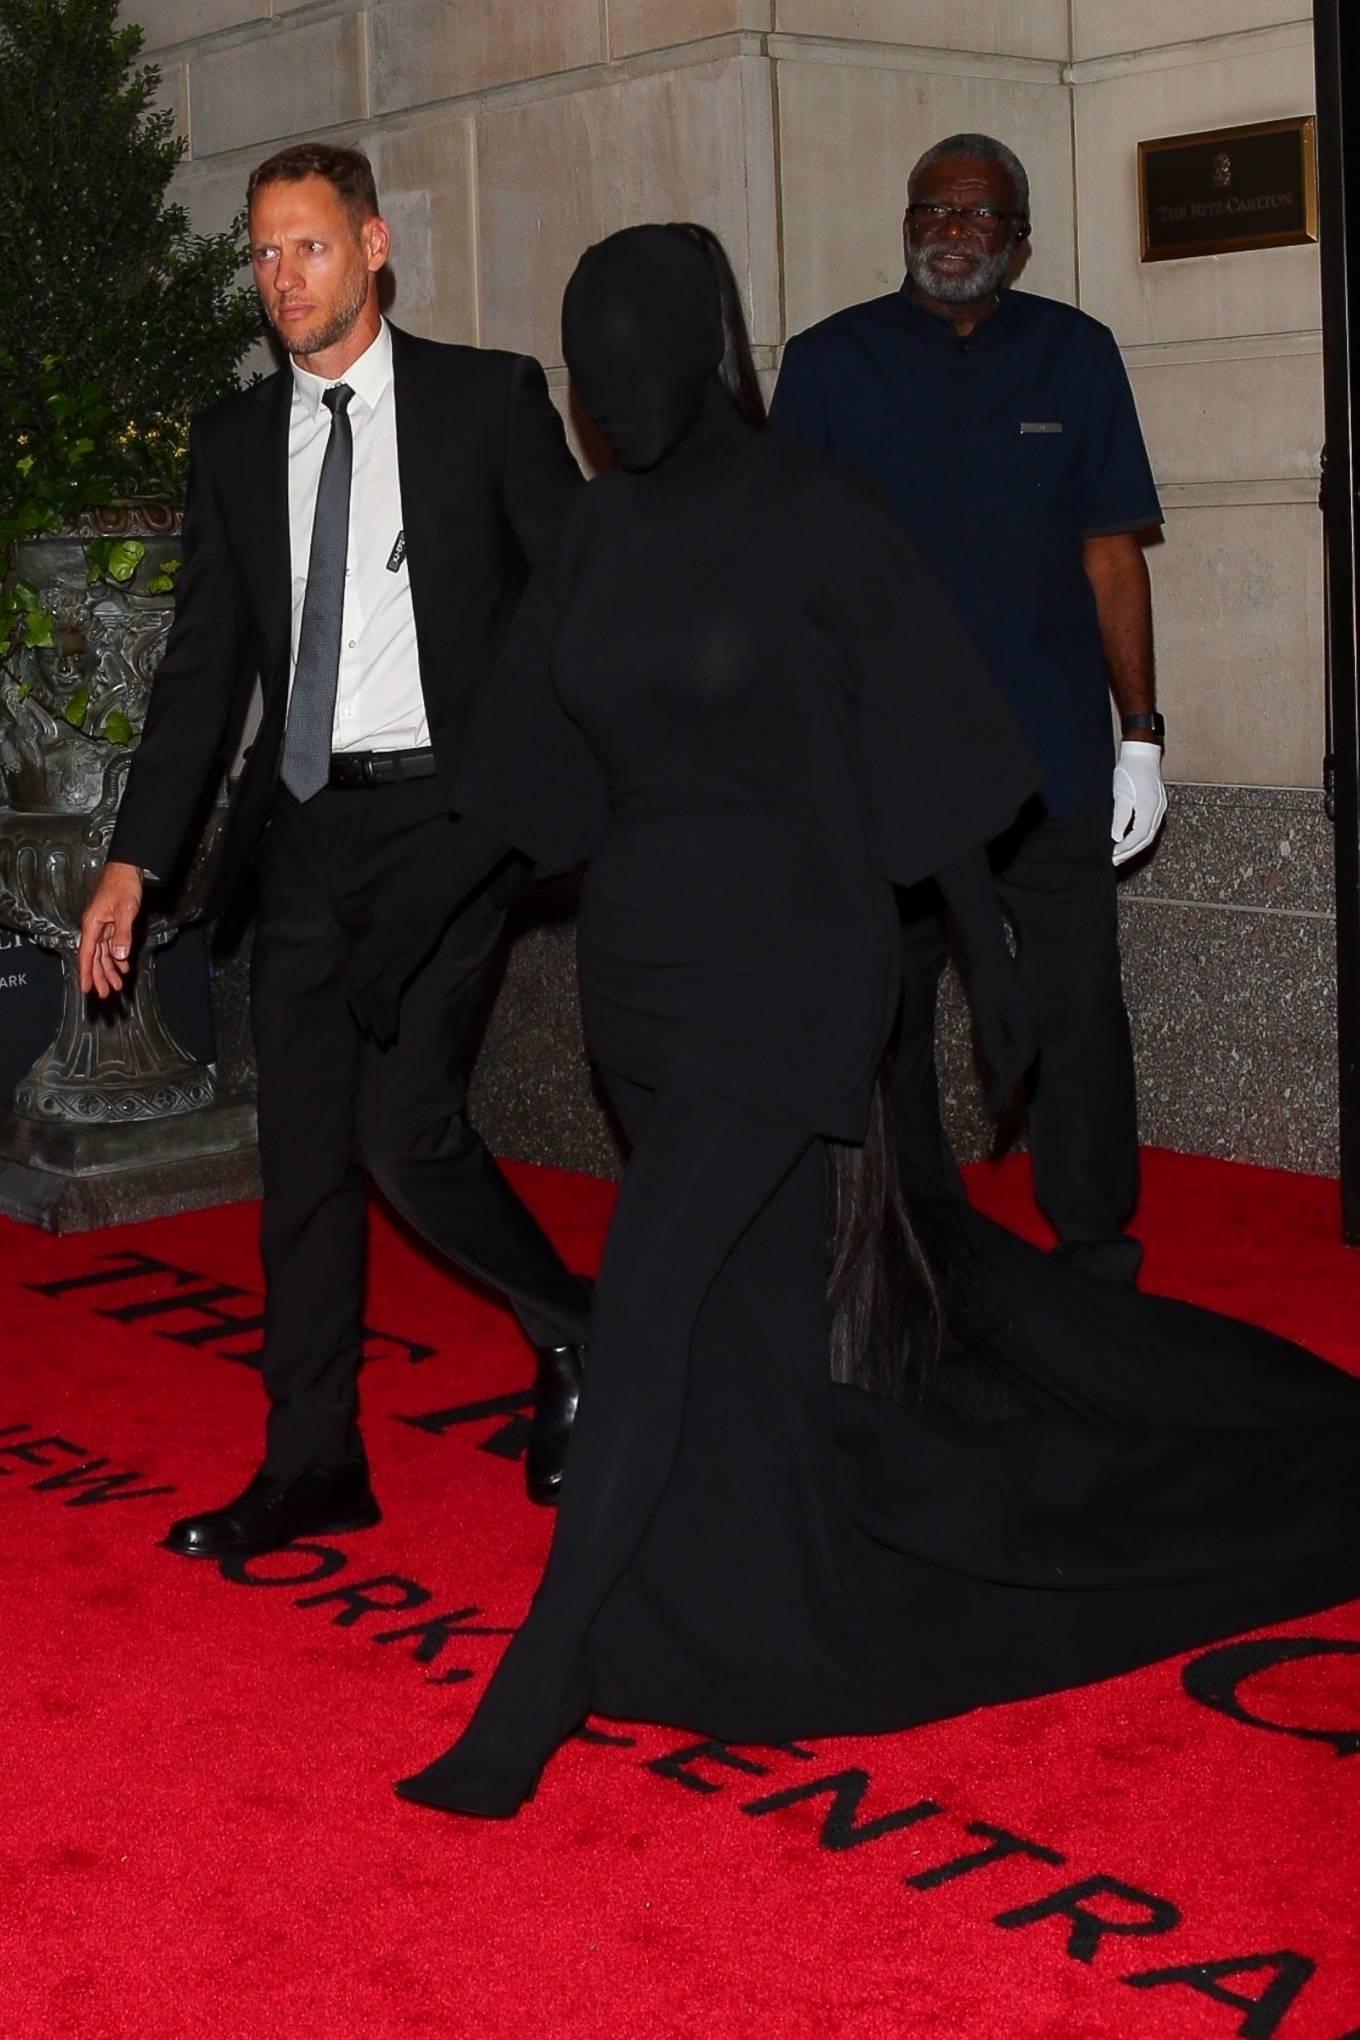 Kim Kardashian - Seen while exits The Ritz-Carlton hotel ahead of the Met Gala in New York